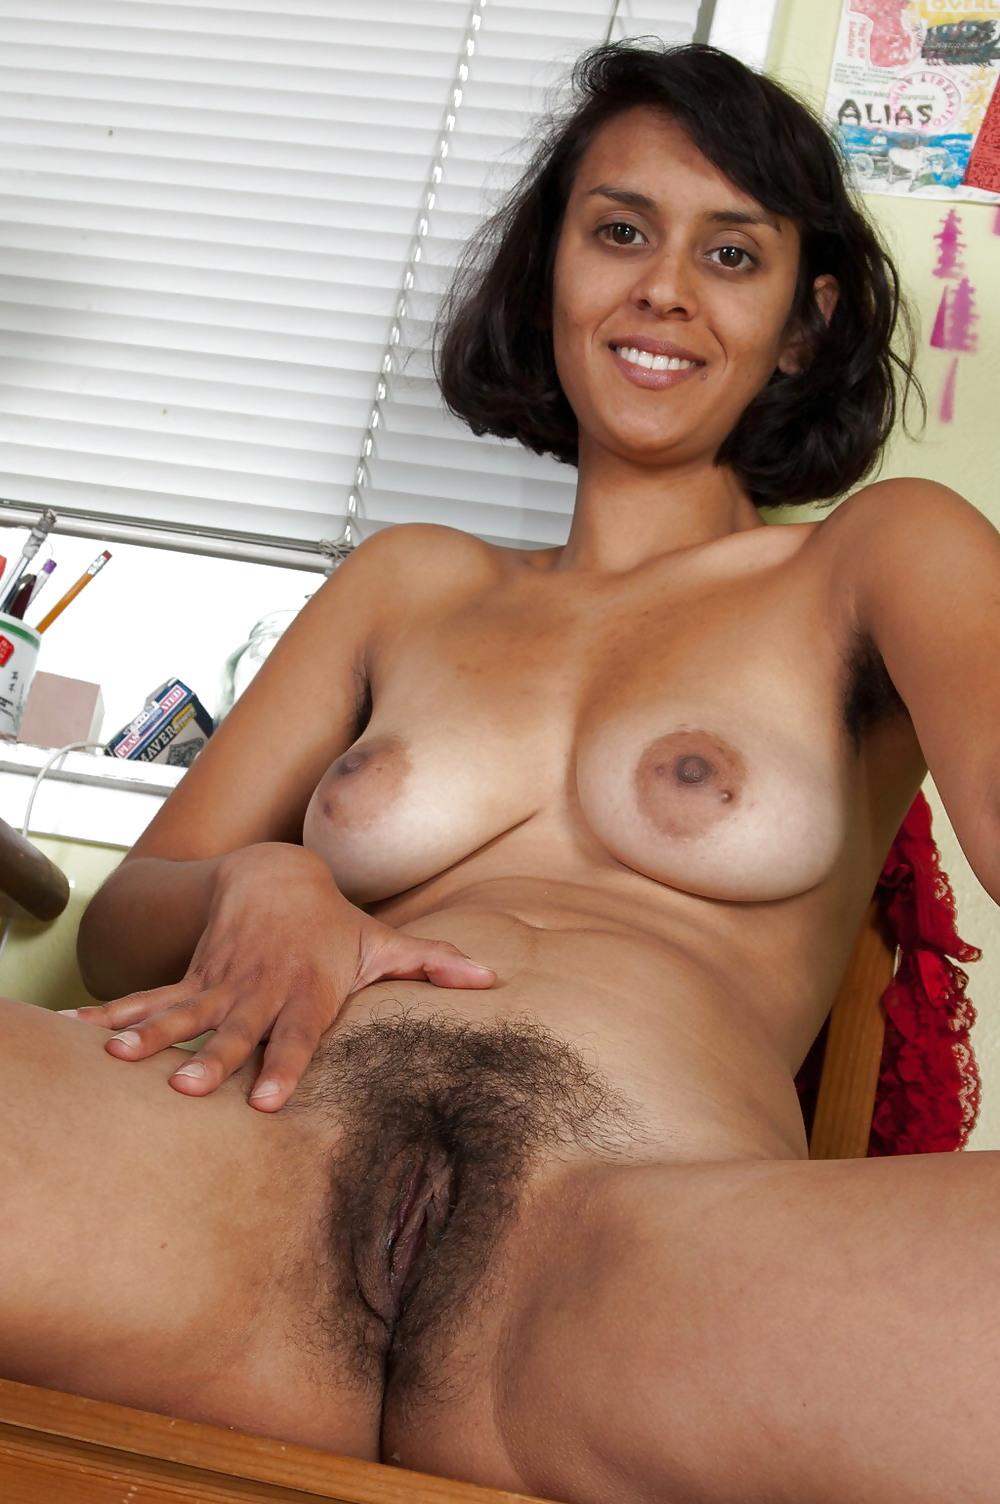 Indian hairy pussy photo galleries, penes y porno